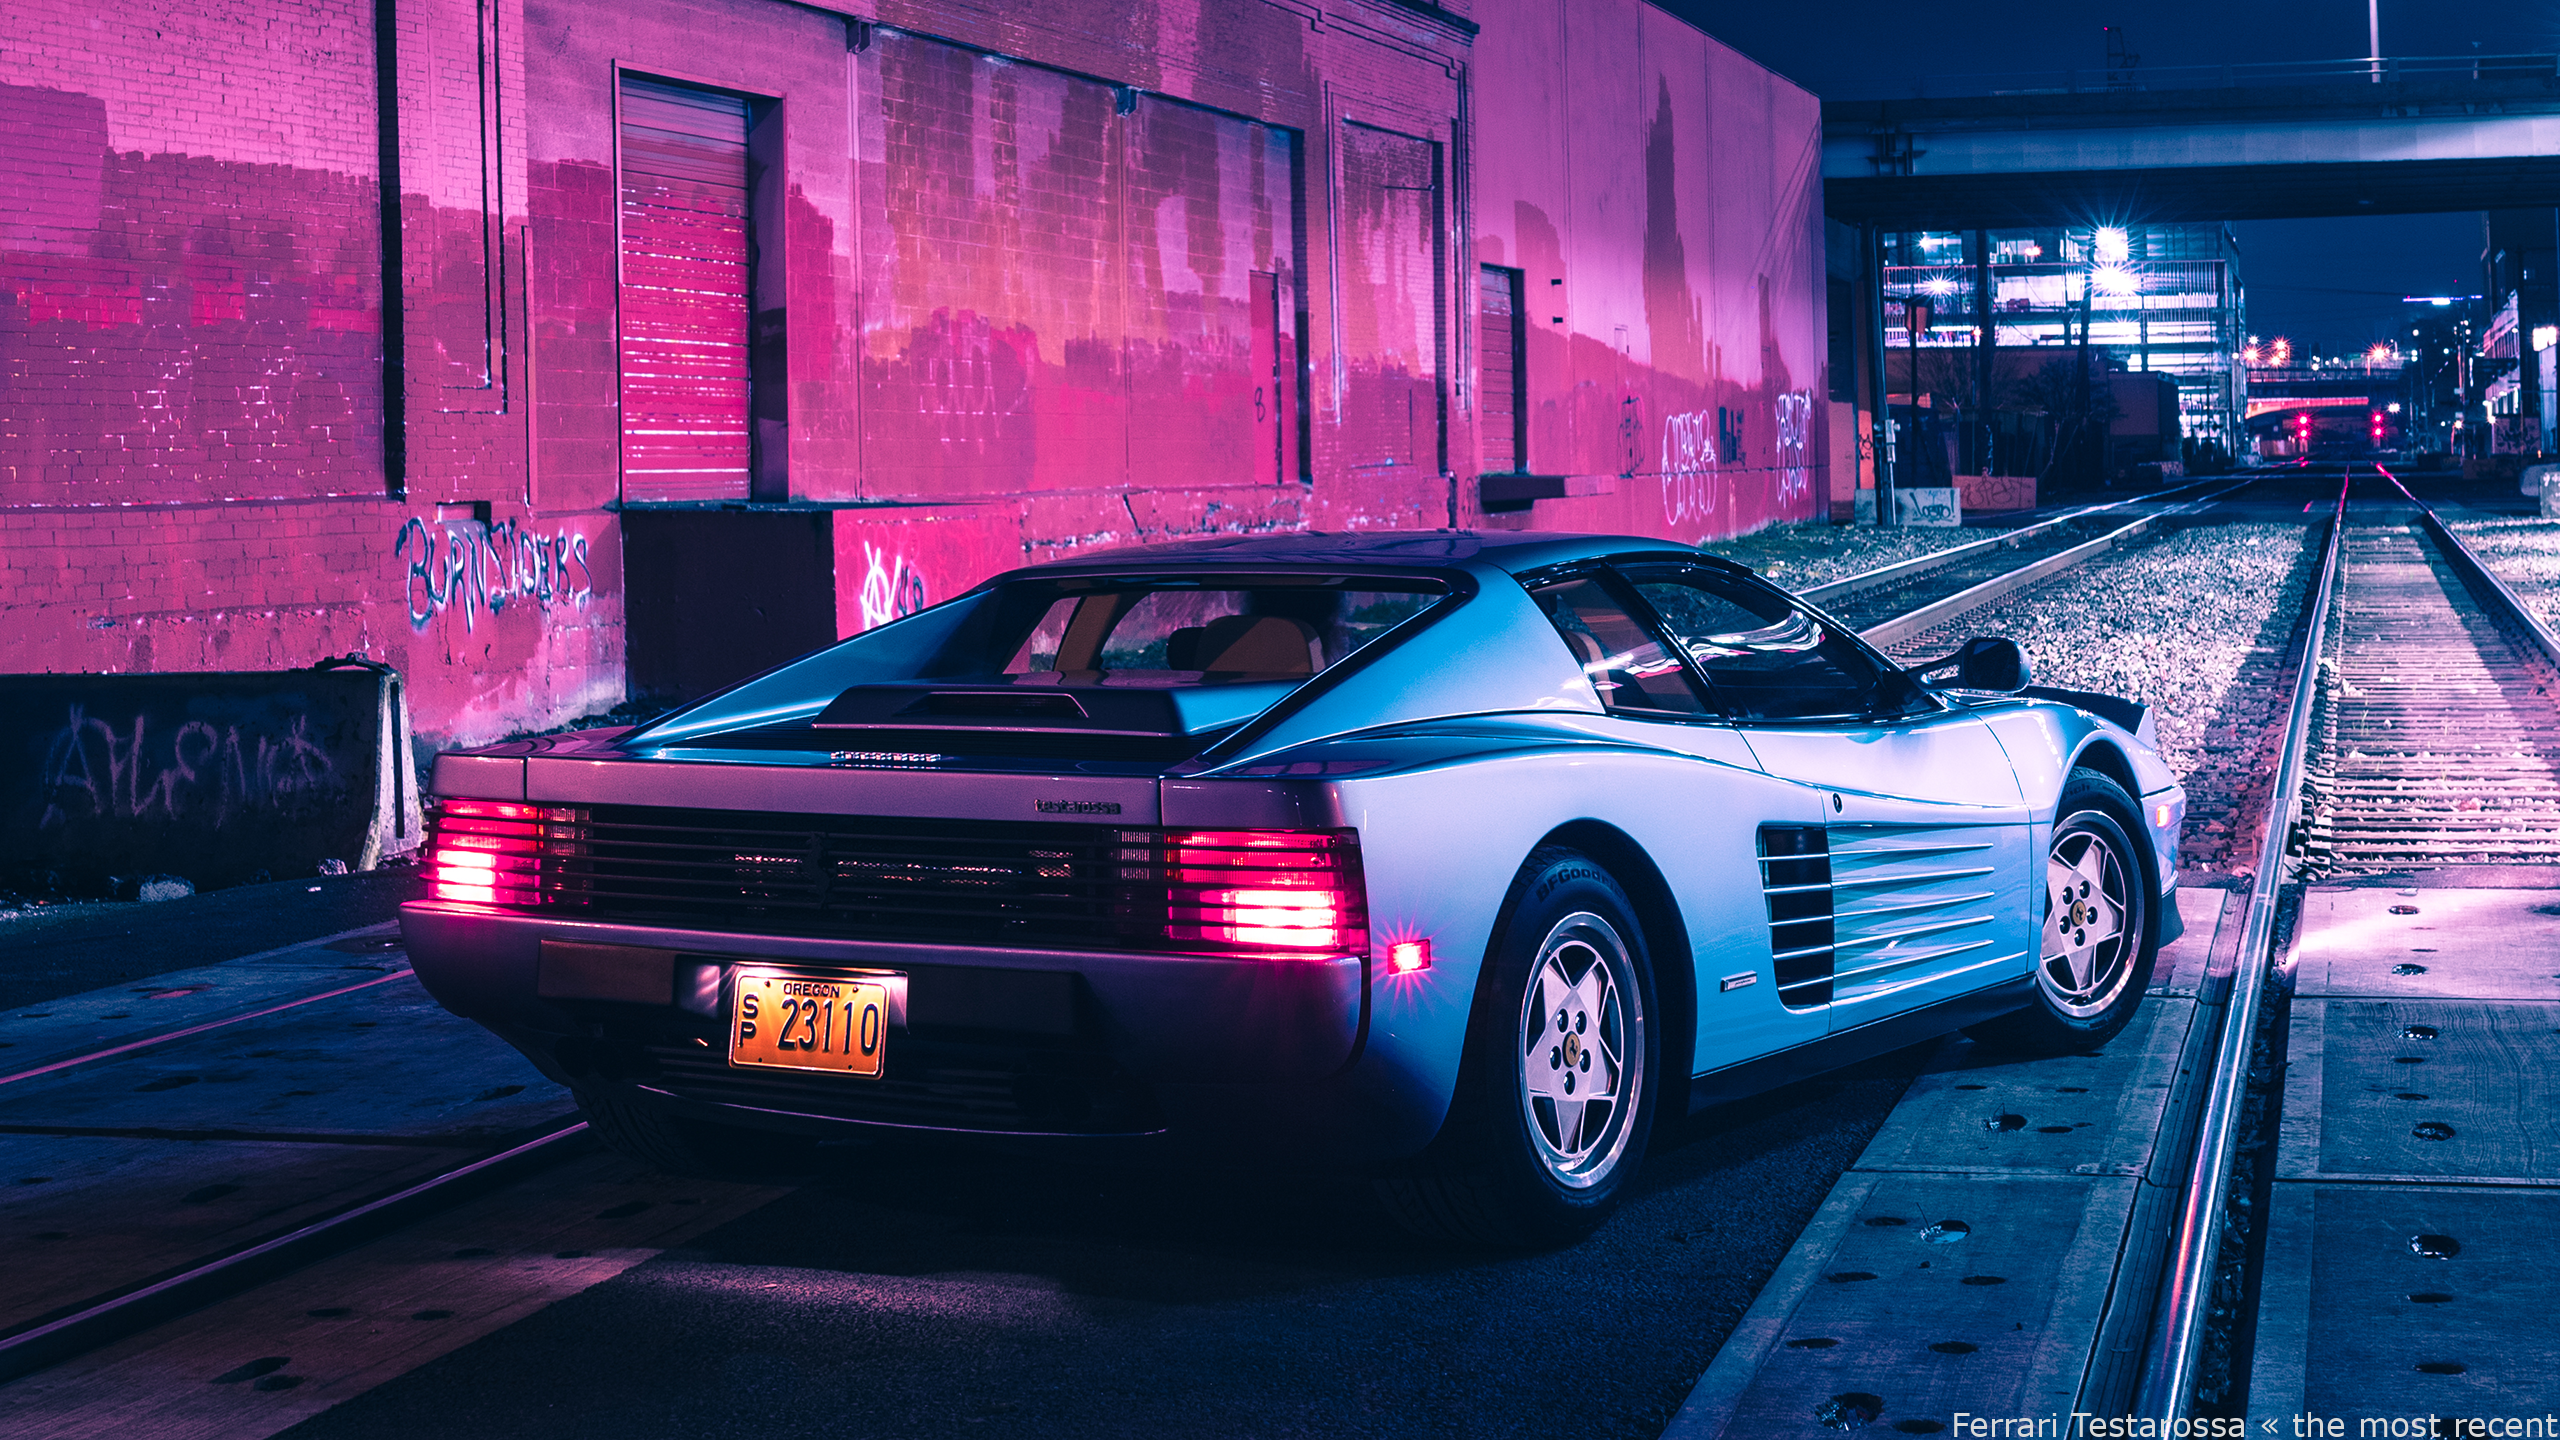 #Cars - Ferrari Testarossa – wonderful